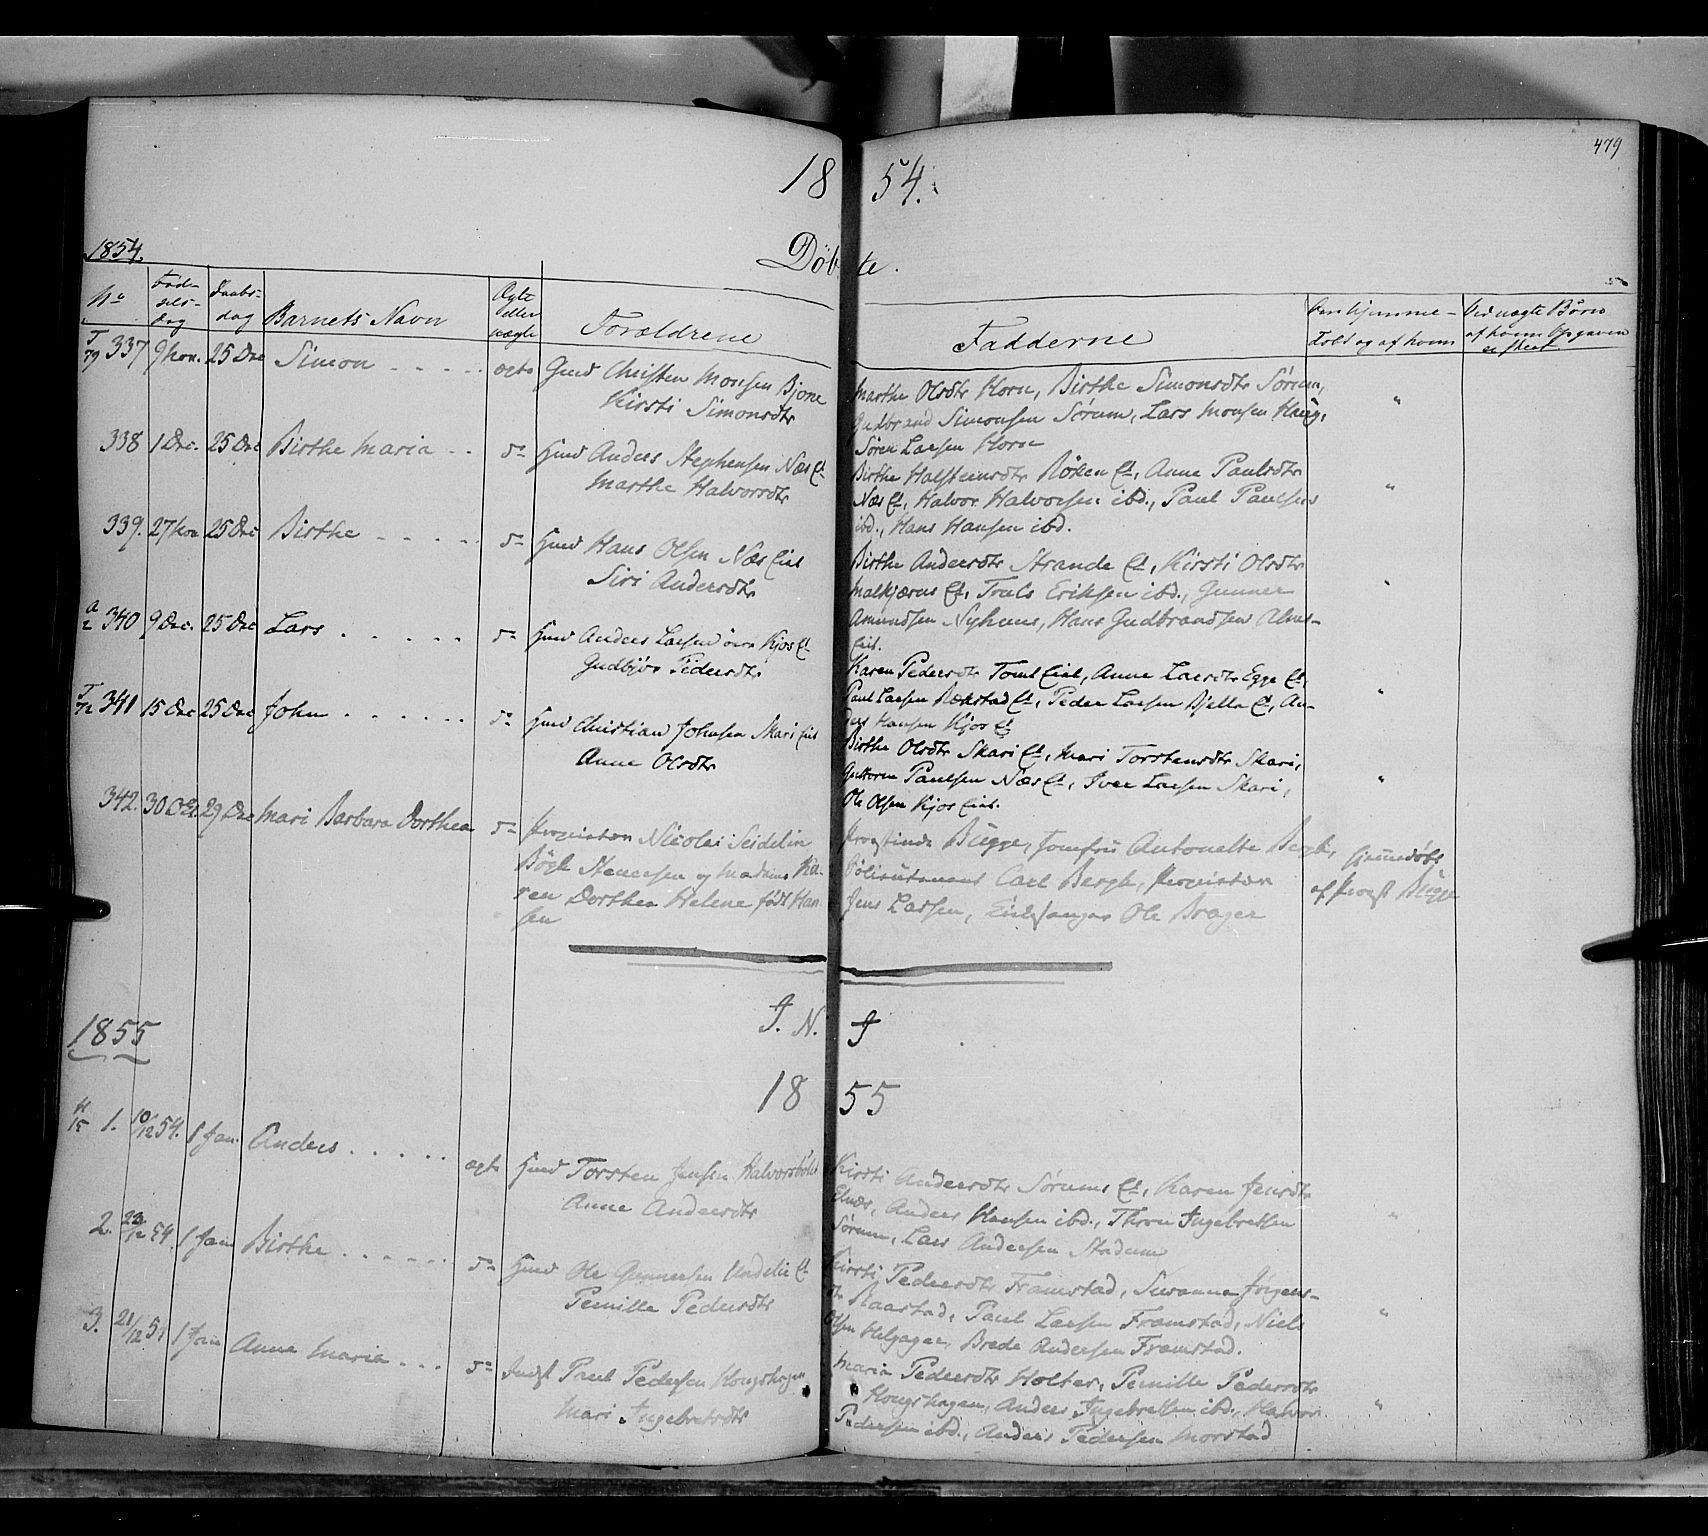 SAH, Gran prestekontor, Ministerialbok nr. 11, 1842-1856, s. 478-479